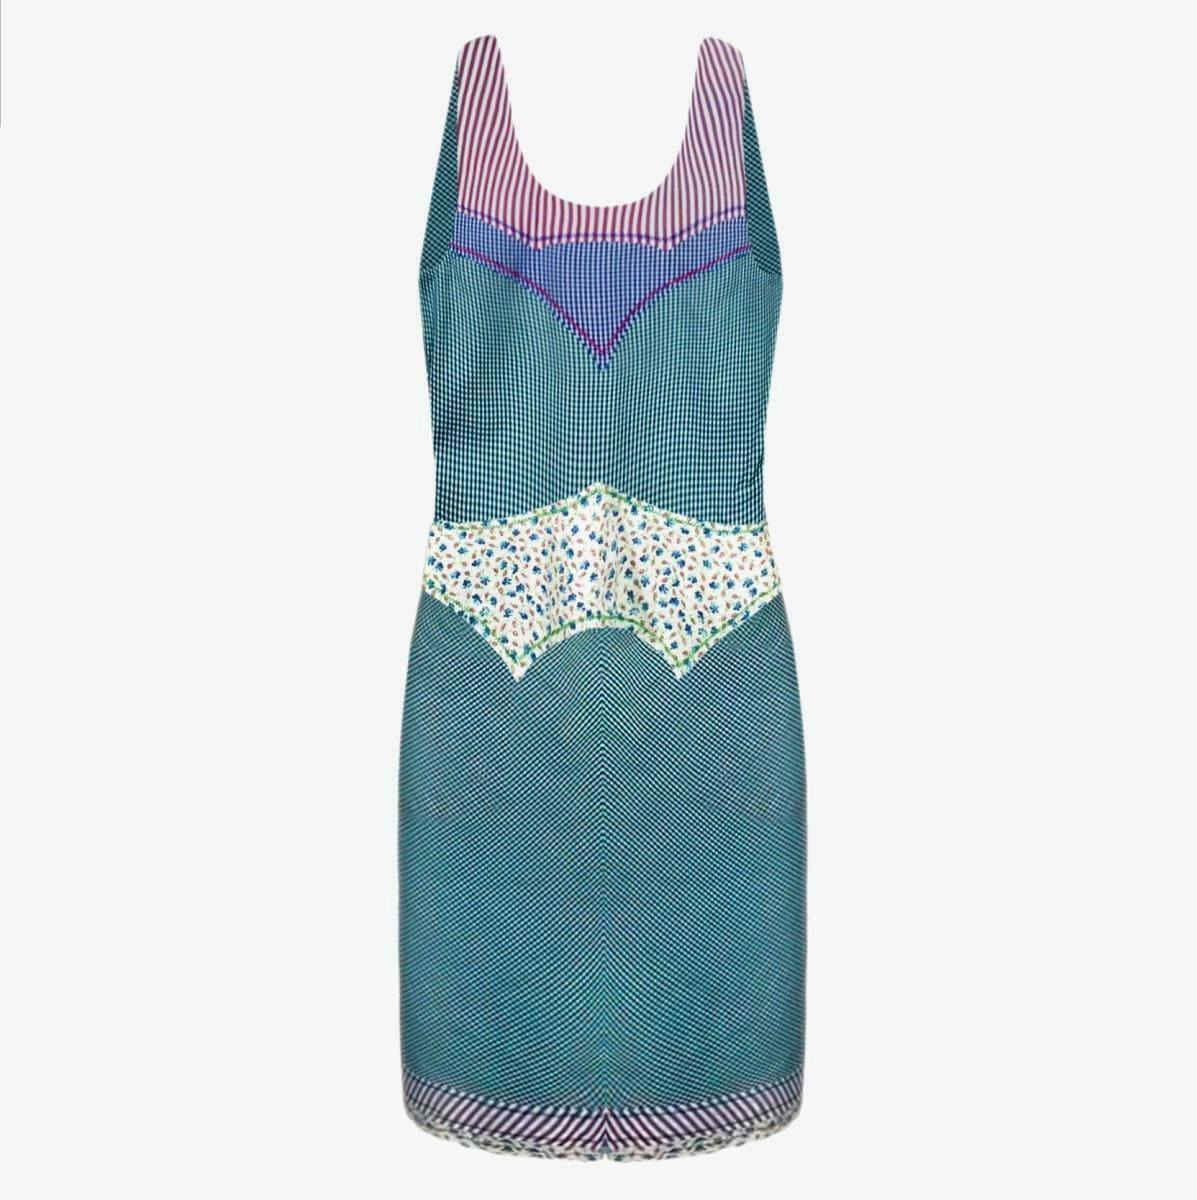 DSQUARED2 NEW Women Summer Summer Summer Dress Size S Womes Plaid Dress Green Sz 40 6 NWT 1500 9dfaef